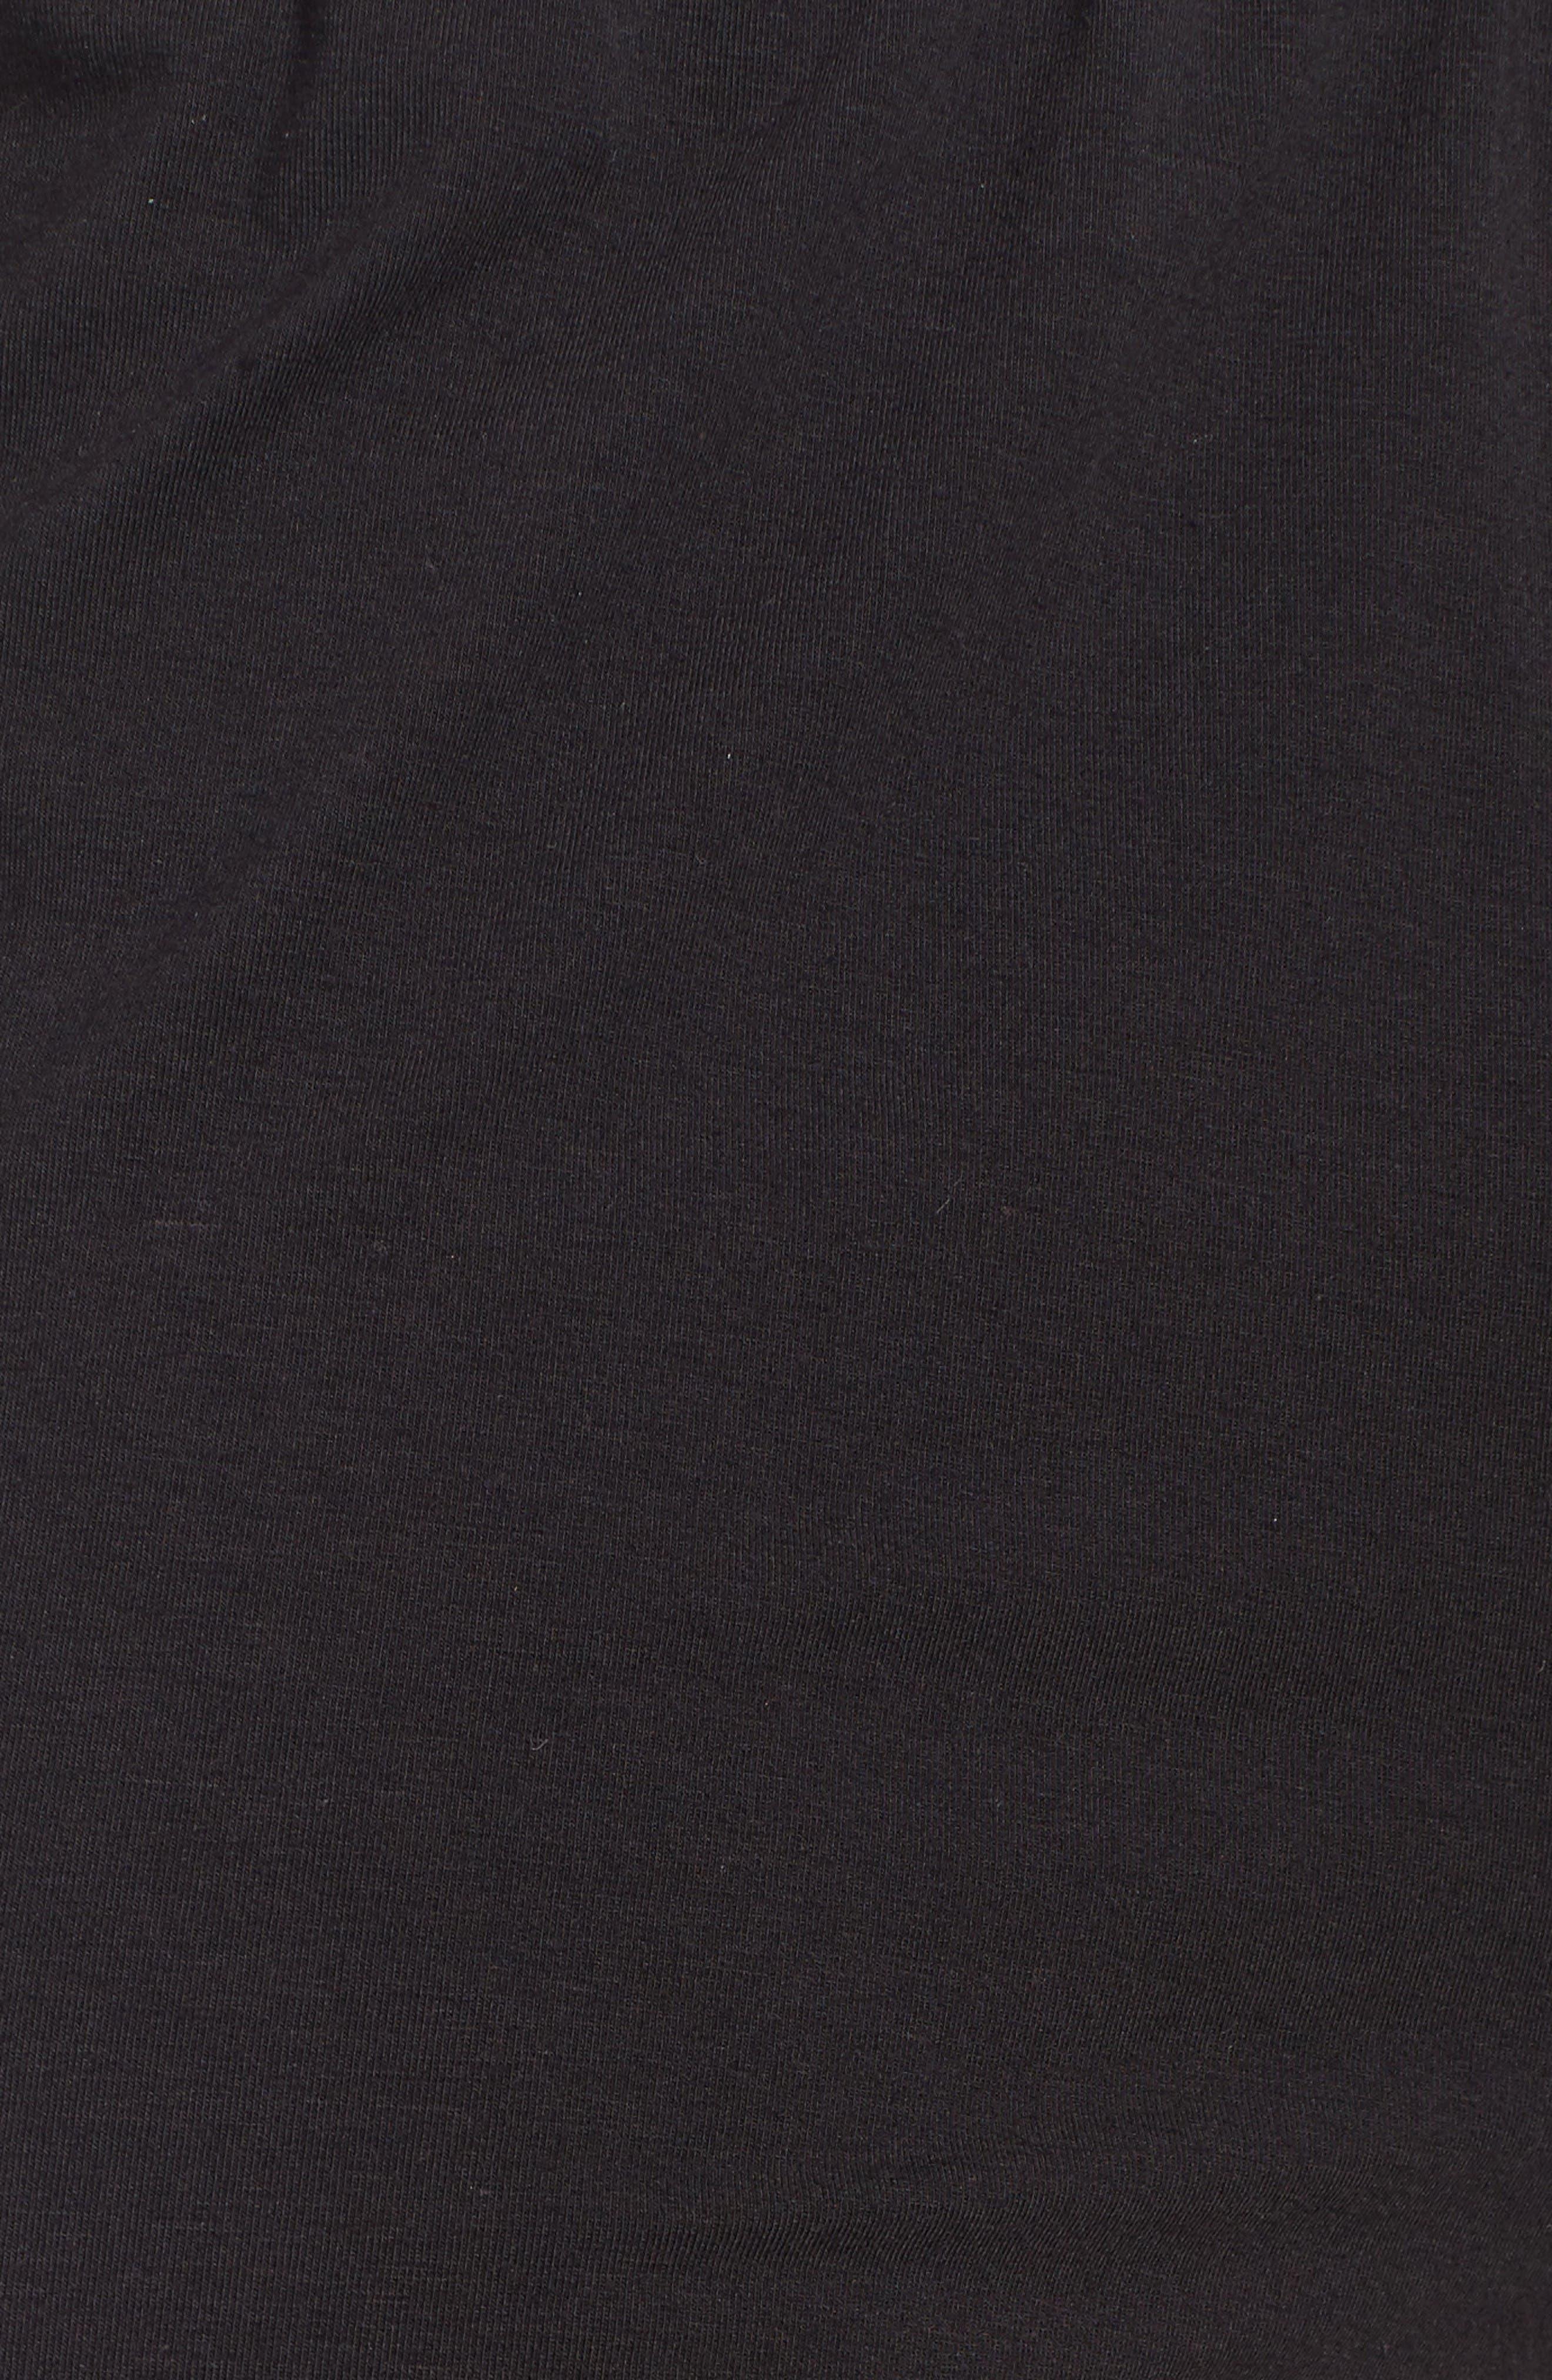 Micromodal Blend Lounge Pants,                             Alternate thumbnail 5, color,                             Black